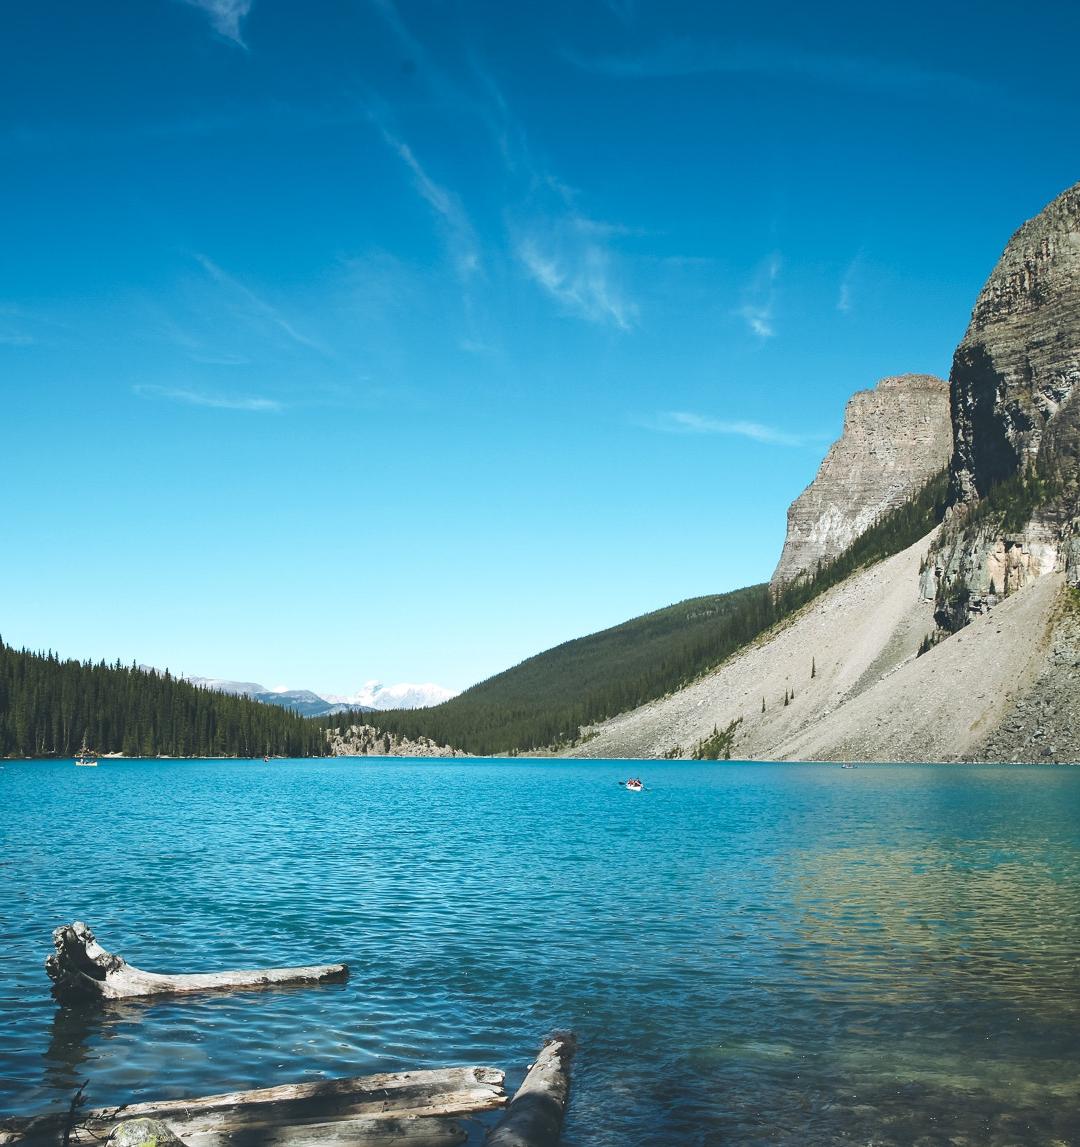 Lake, Cliff, Tree iPhone Wallpaper